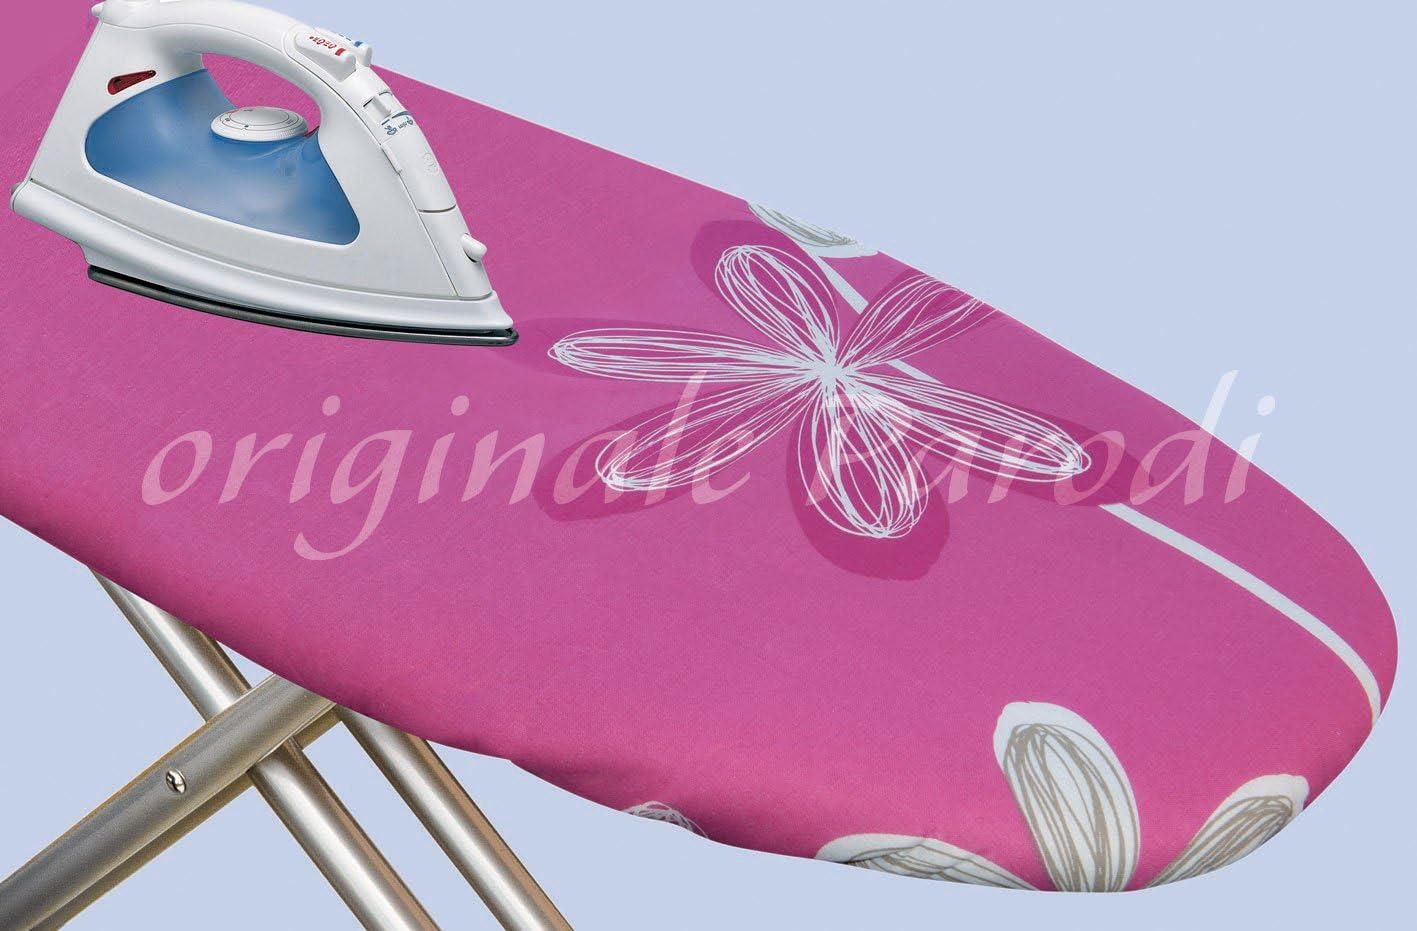 art 433 Parodi ironing board cover board cover suitable for all ironing boards Ironing board cover triple layer 140x50 cm ironing board cover Universal ironing board cover parts various colors